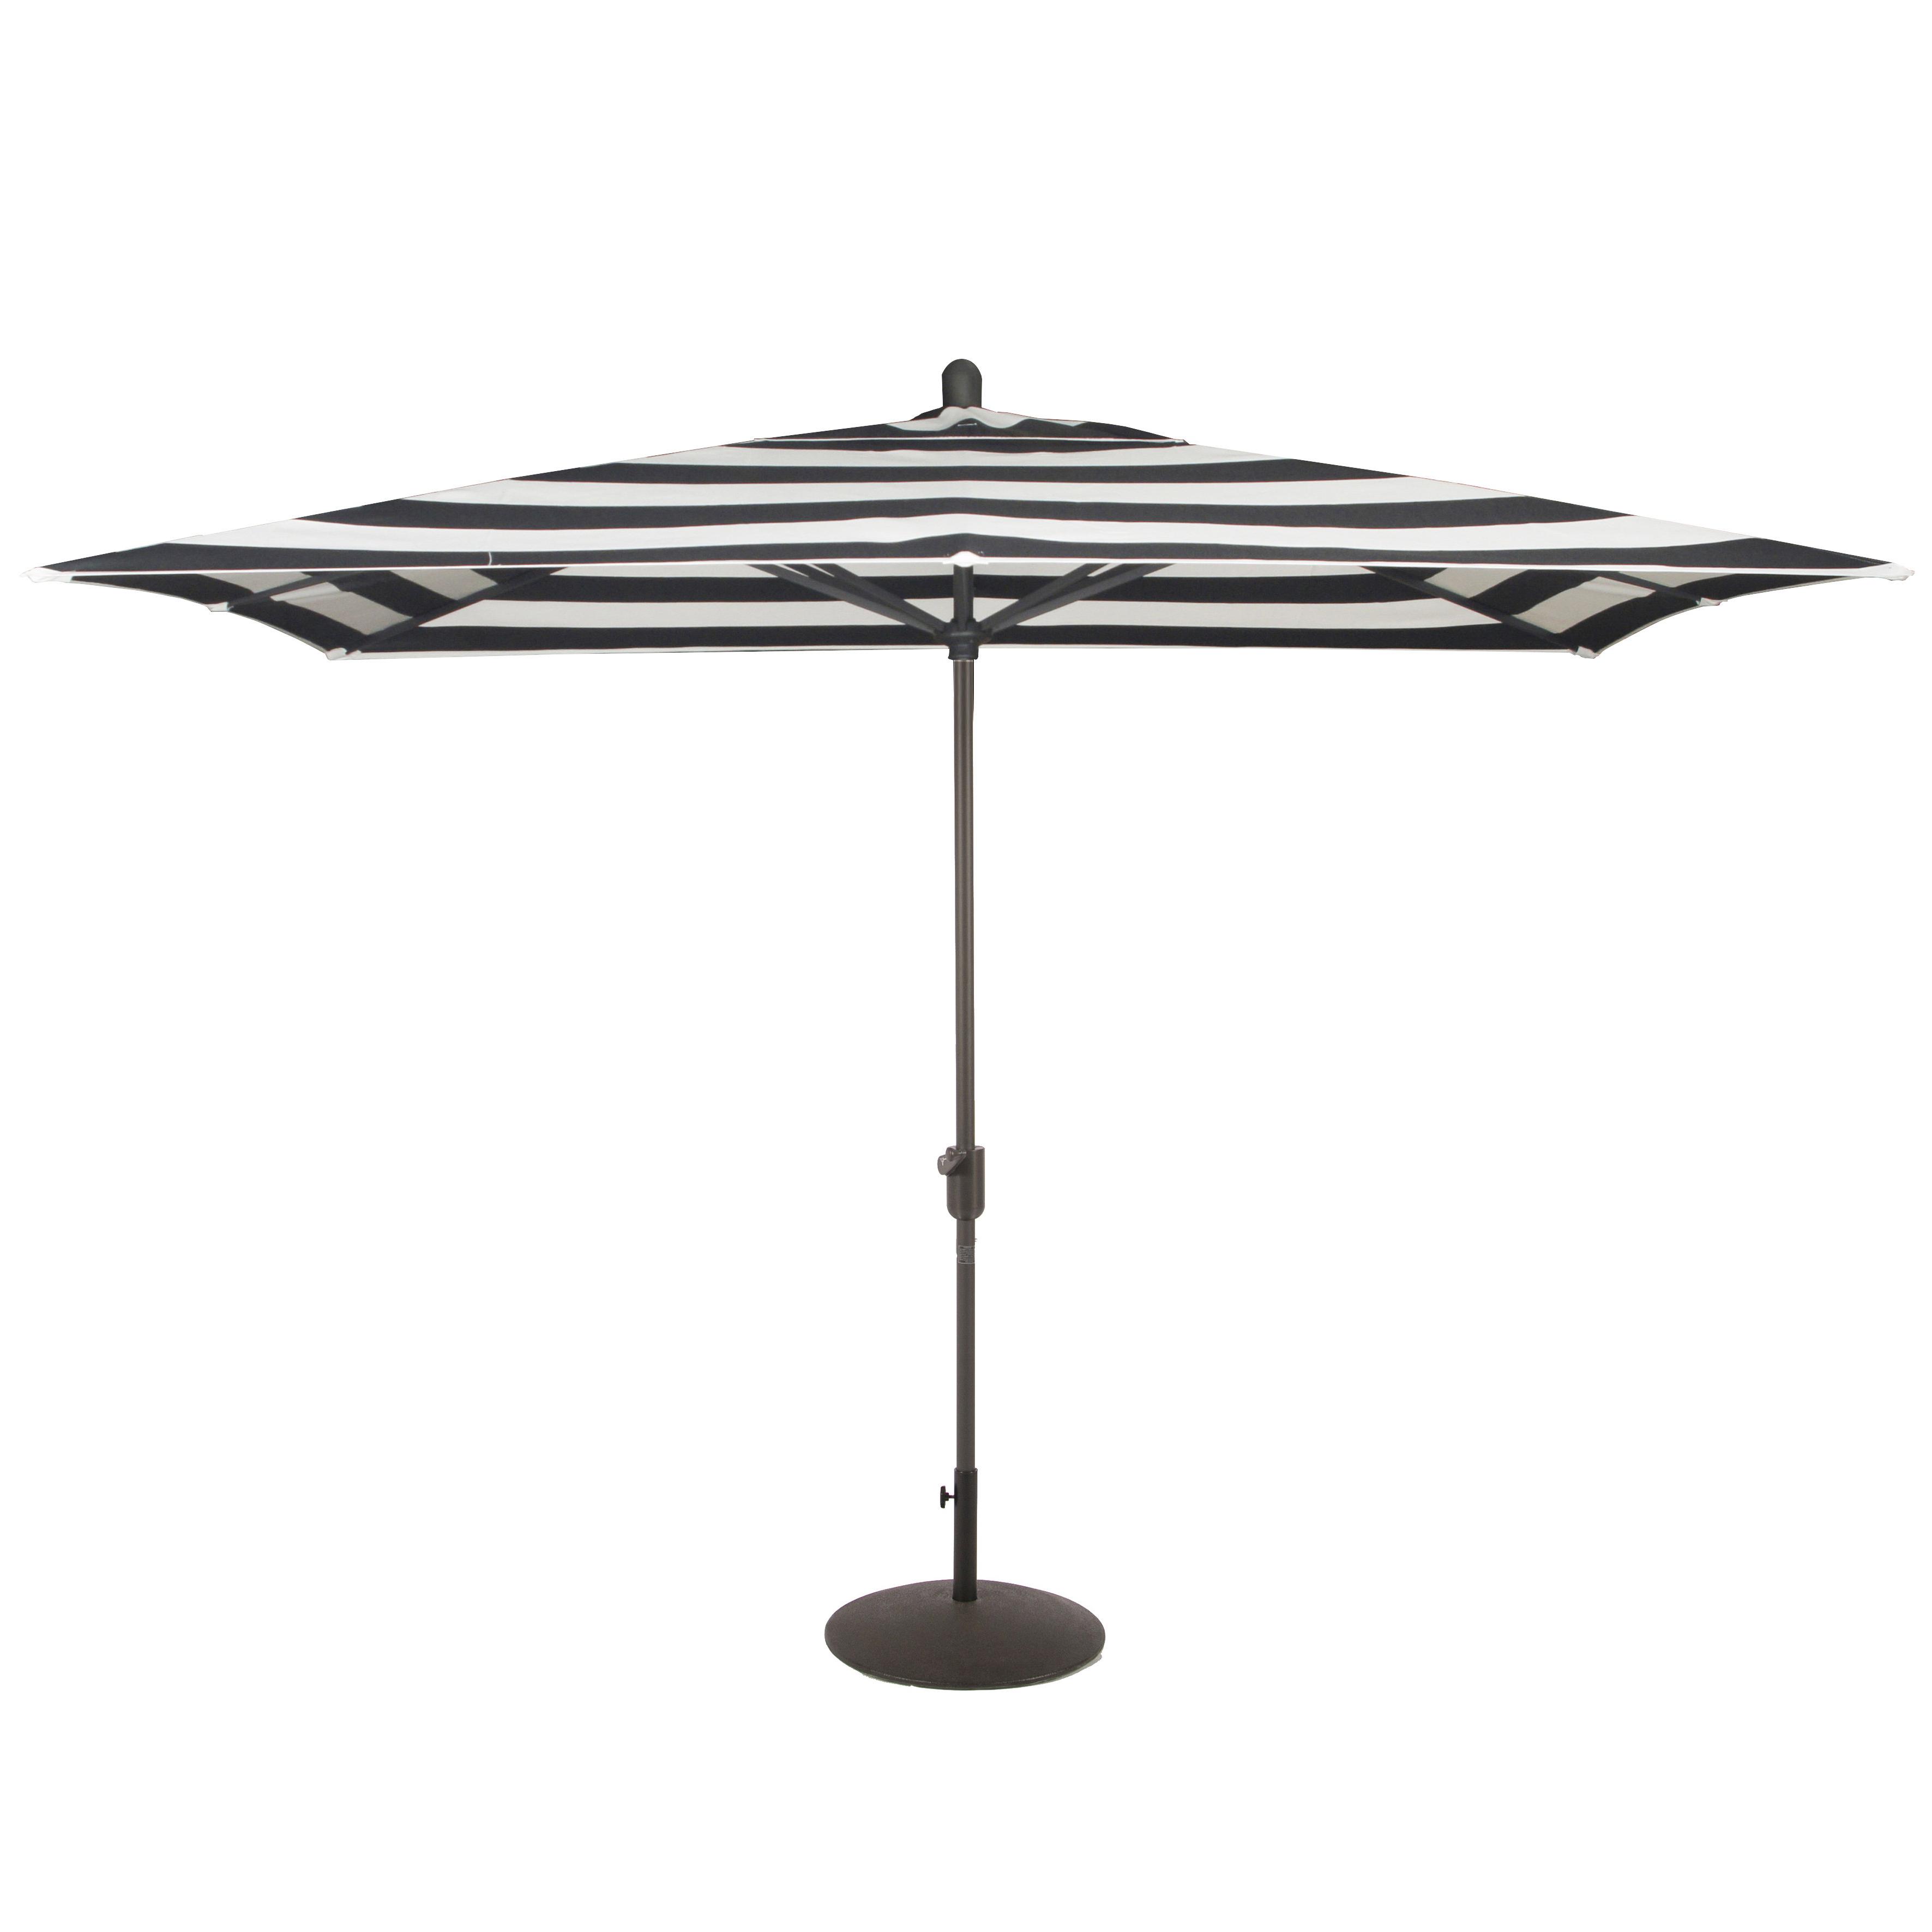 Latest Darwen Tiltable Patio Stripe Market Umbrellas With Wieczorek Auto Tilt 10' X  (View 12 of 20)